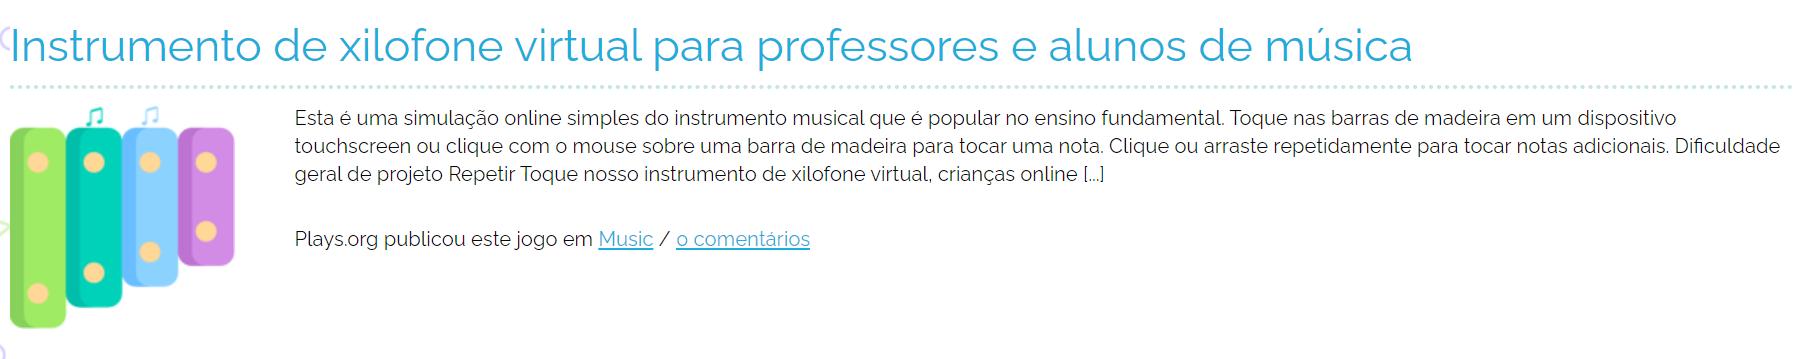 jogos on line música